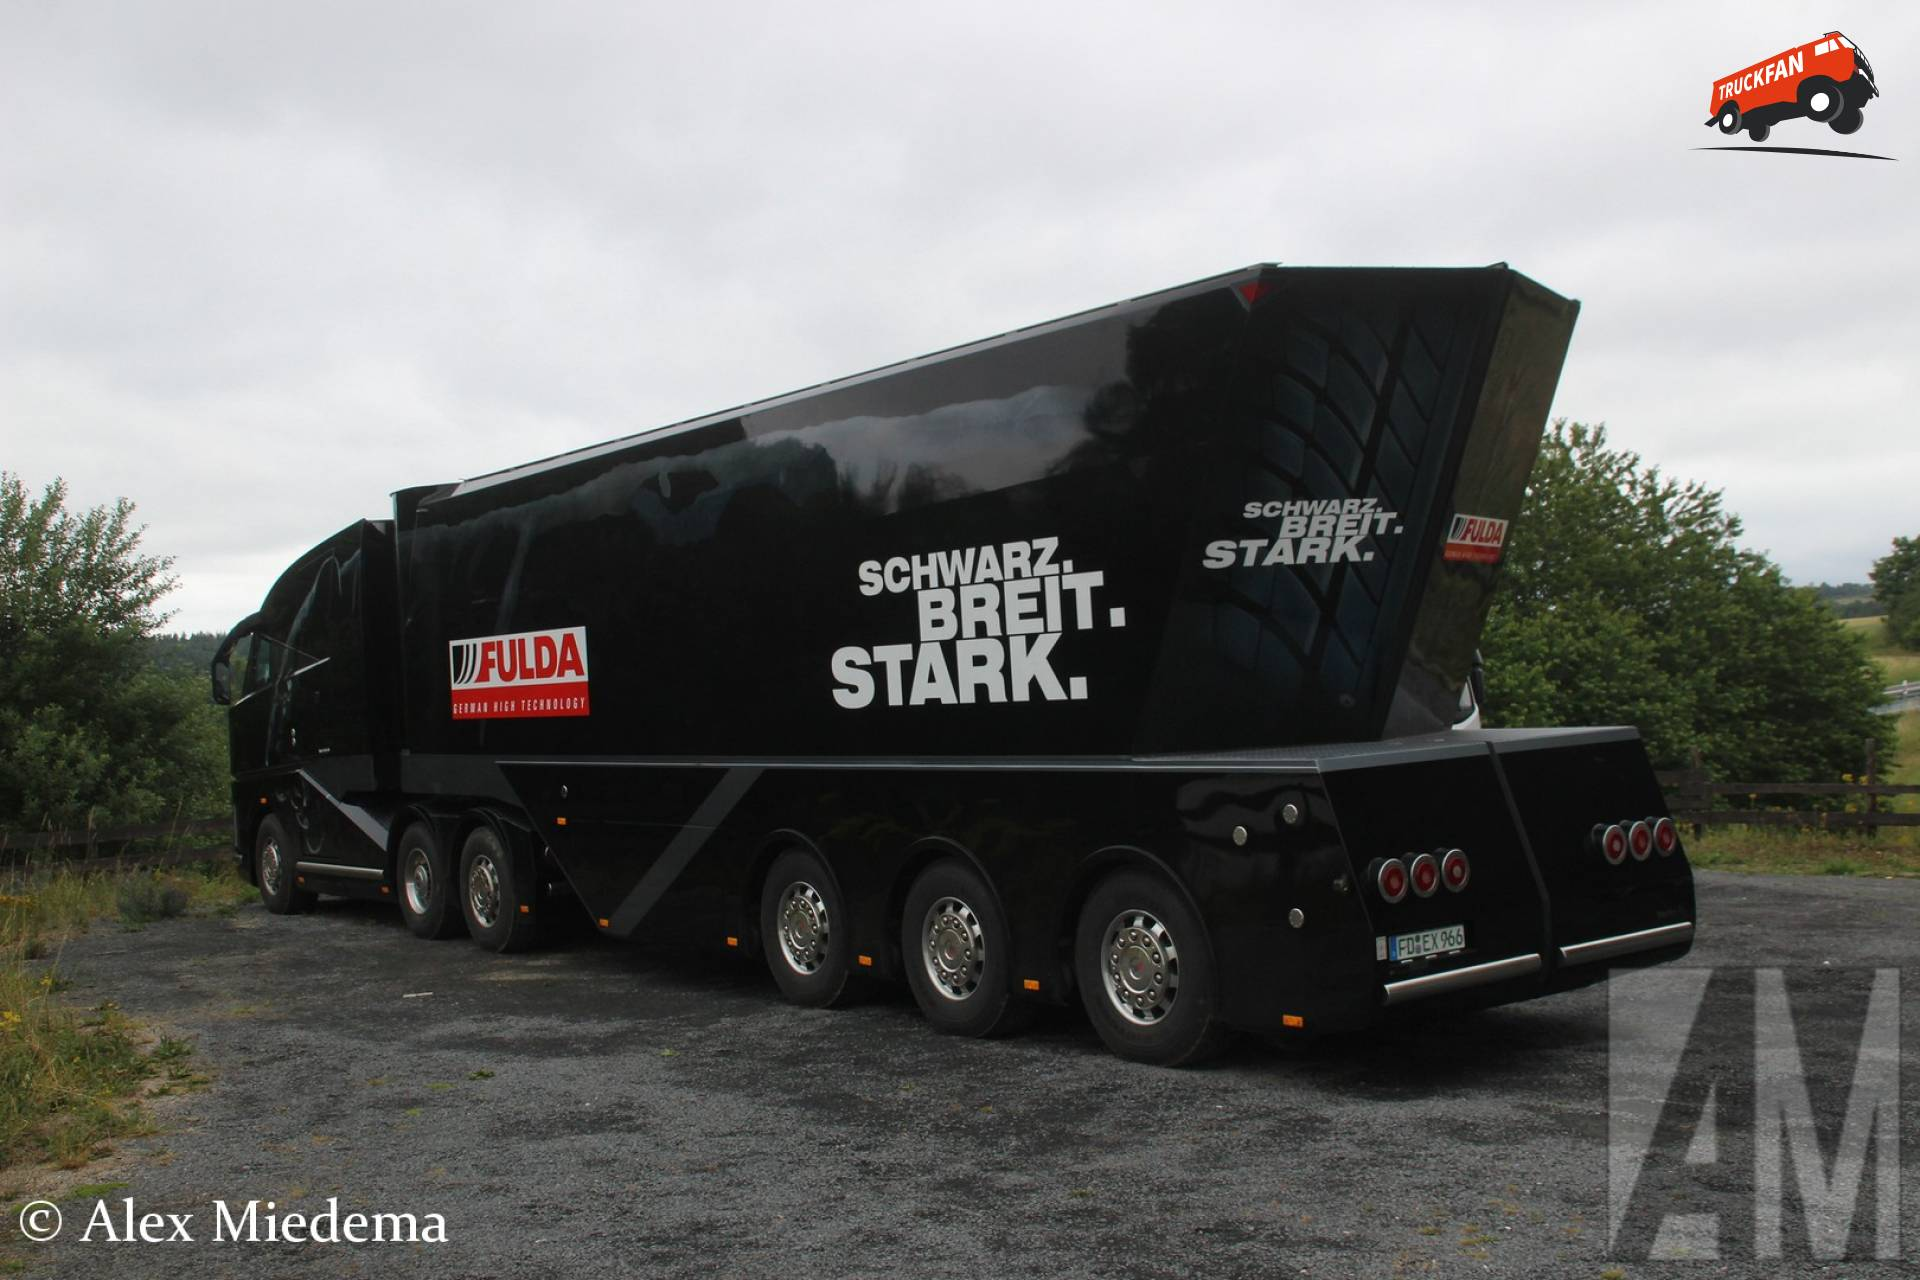 MAN Fulda truck